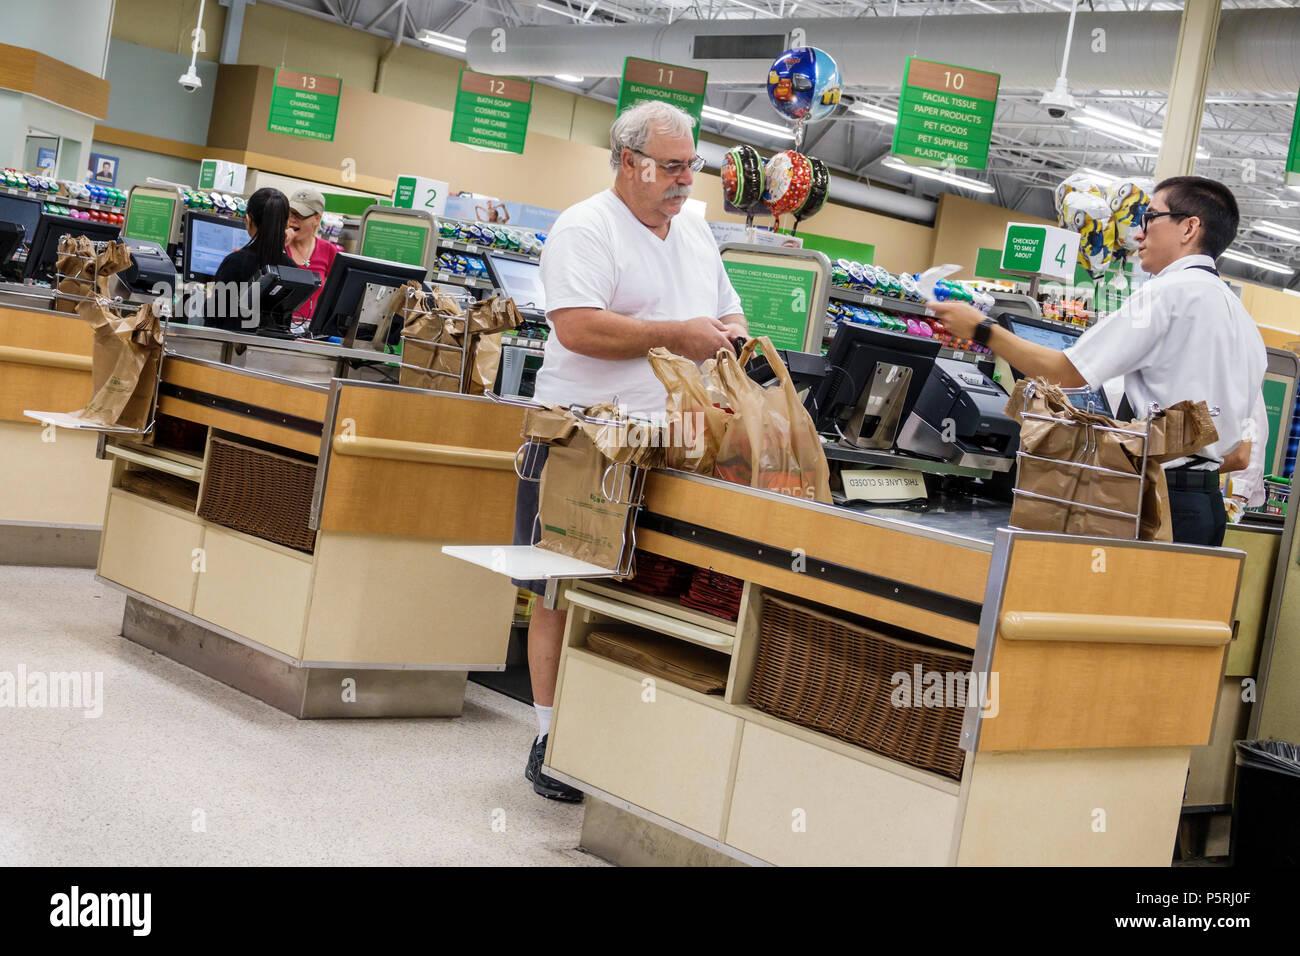 Stuart Florida Publix grocery store supermarket food